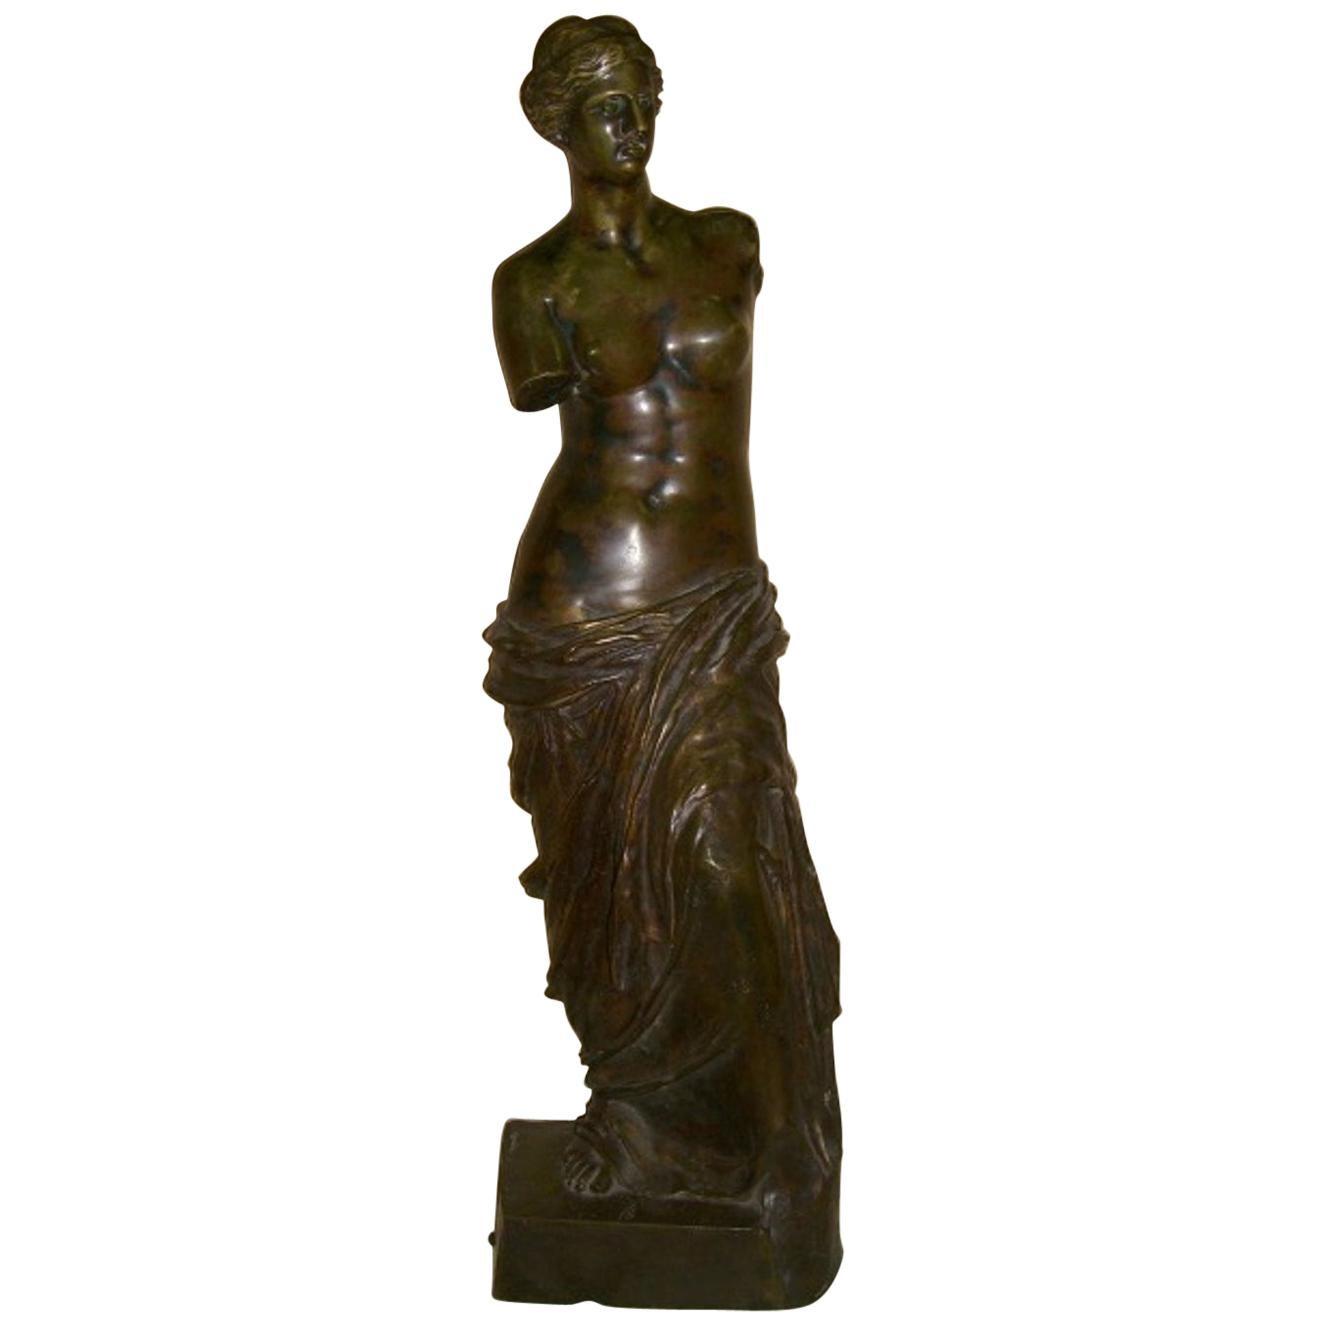 French Patinated Bronze Sculpture of Venus de Milo